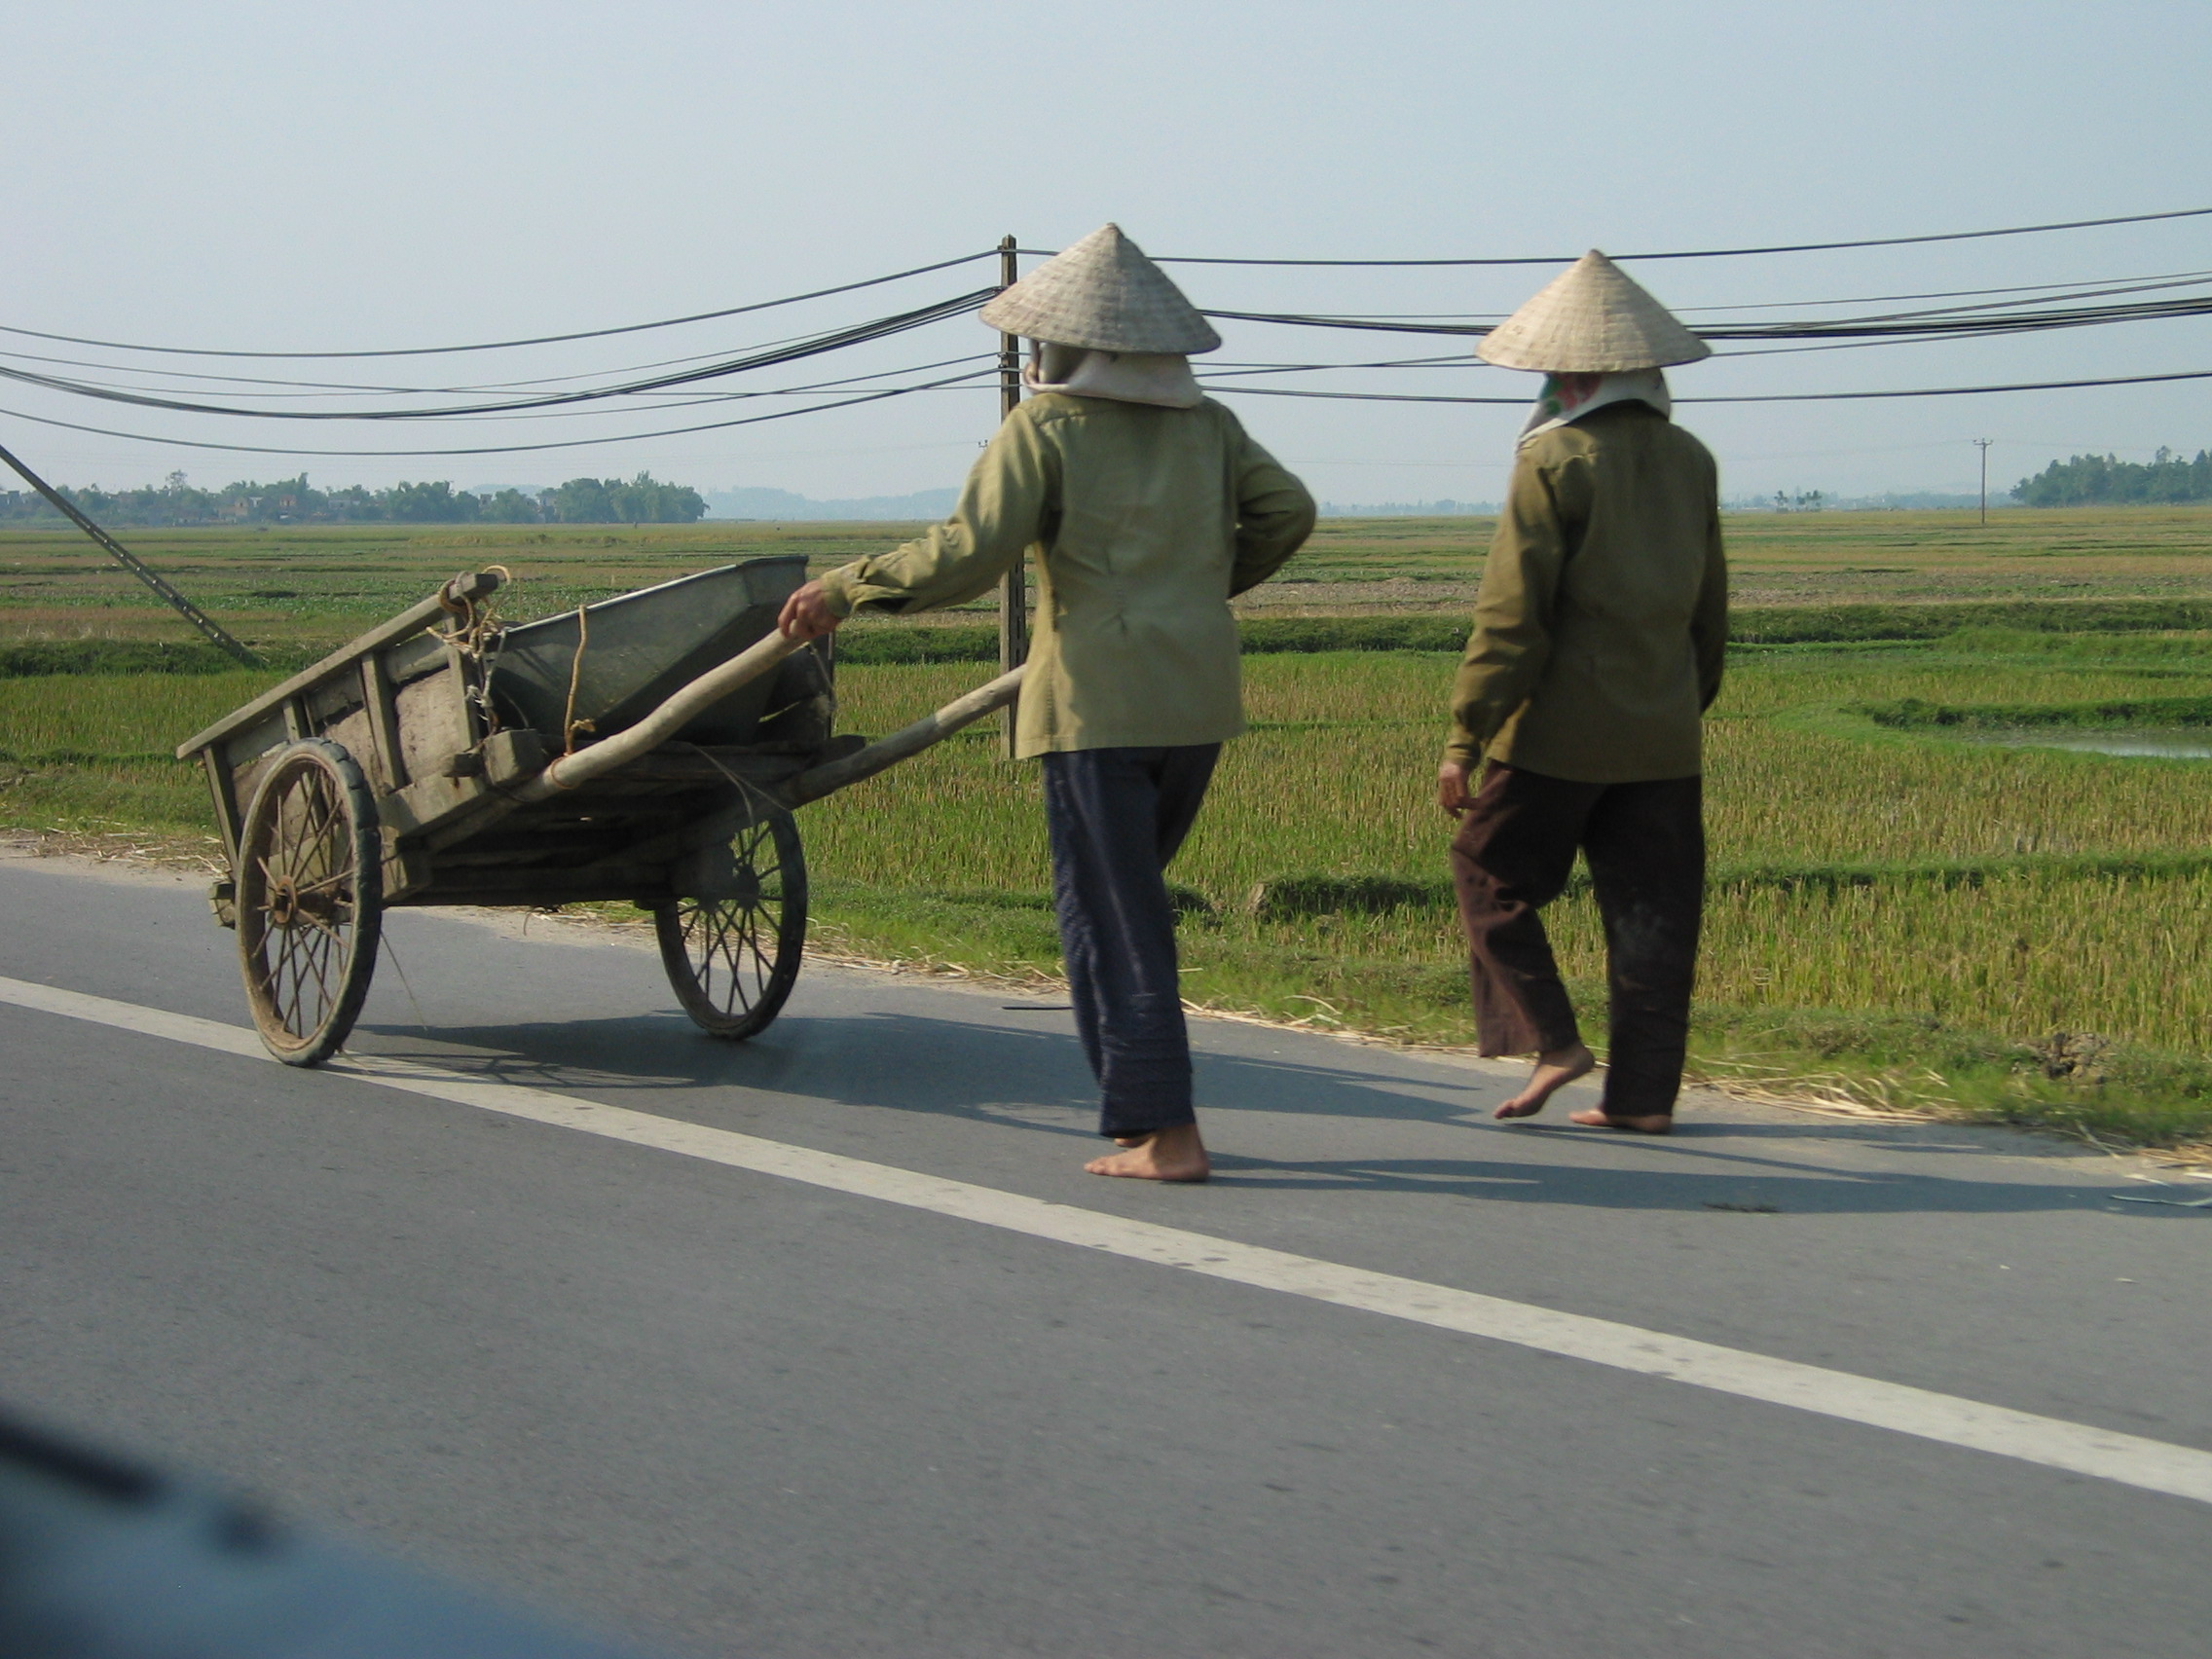 Autobahn traffic